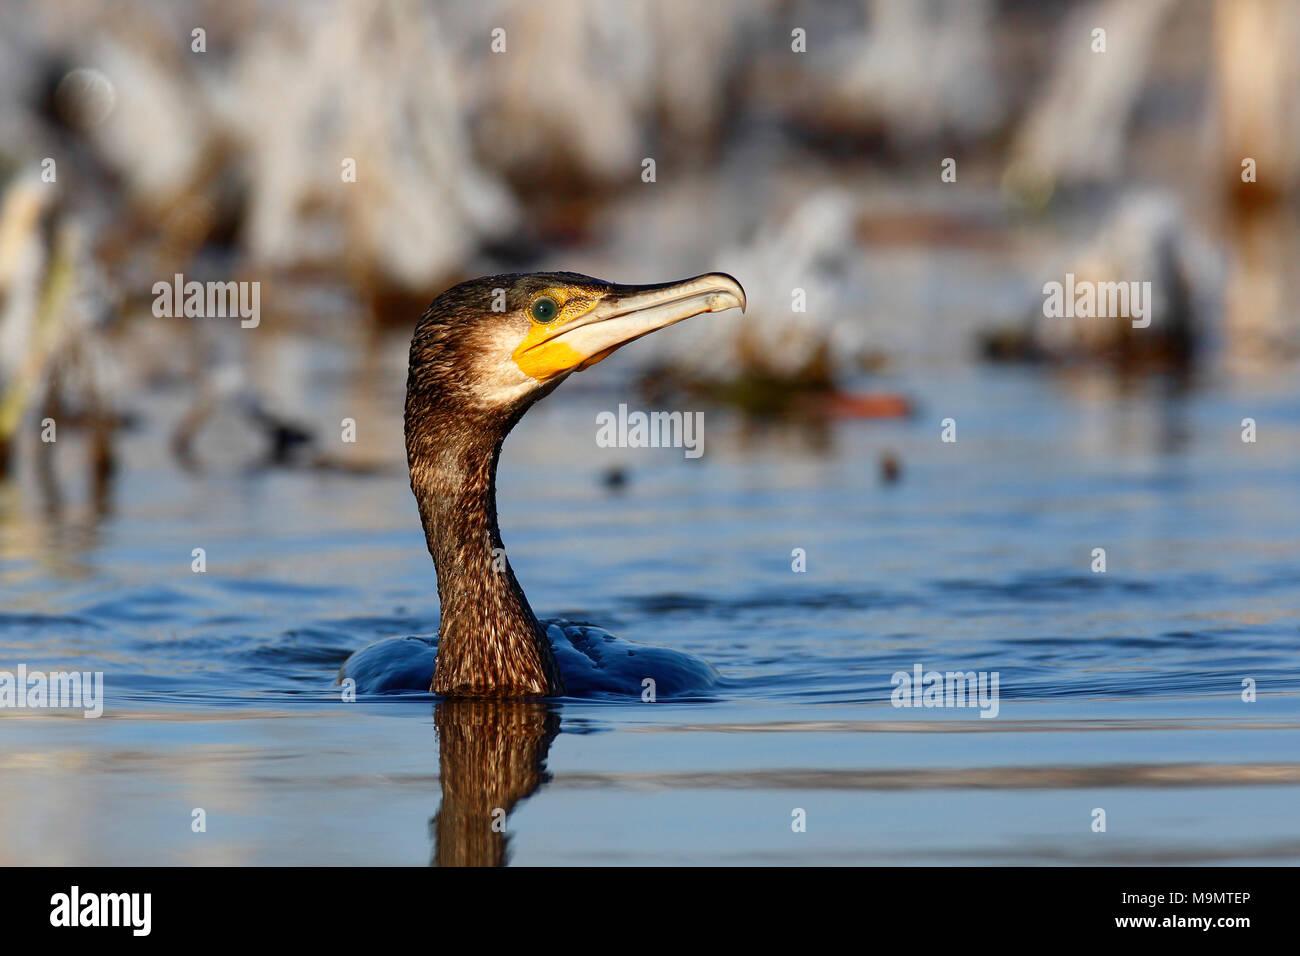 Great cormorant (Phalacrocorax carbo) in water, animal portrait, Biosphere Reserve Middle Elbe, Dessau-Roßlau, Saxony-Anhalt - Stock Image